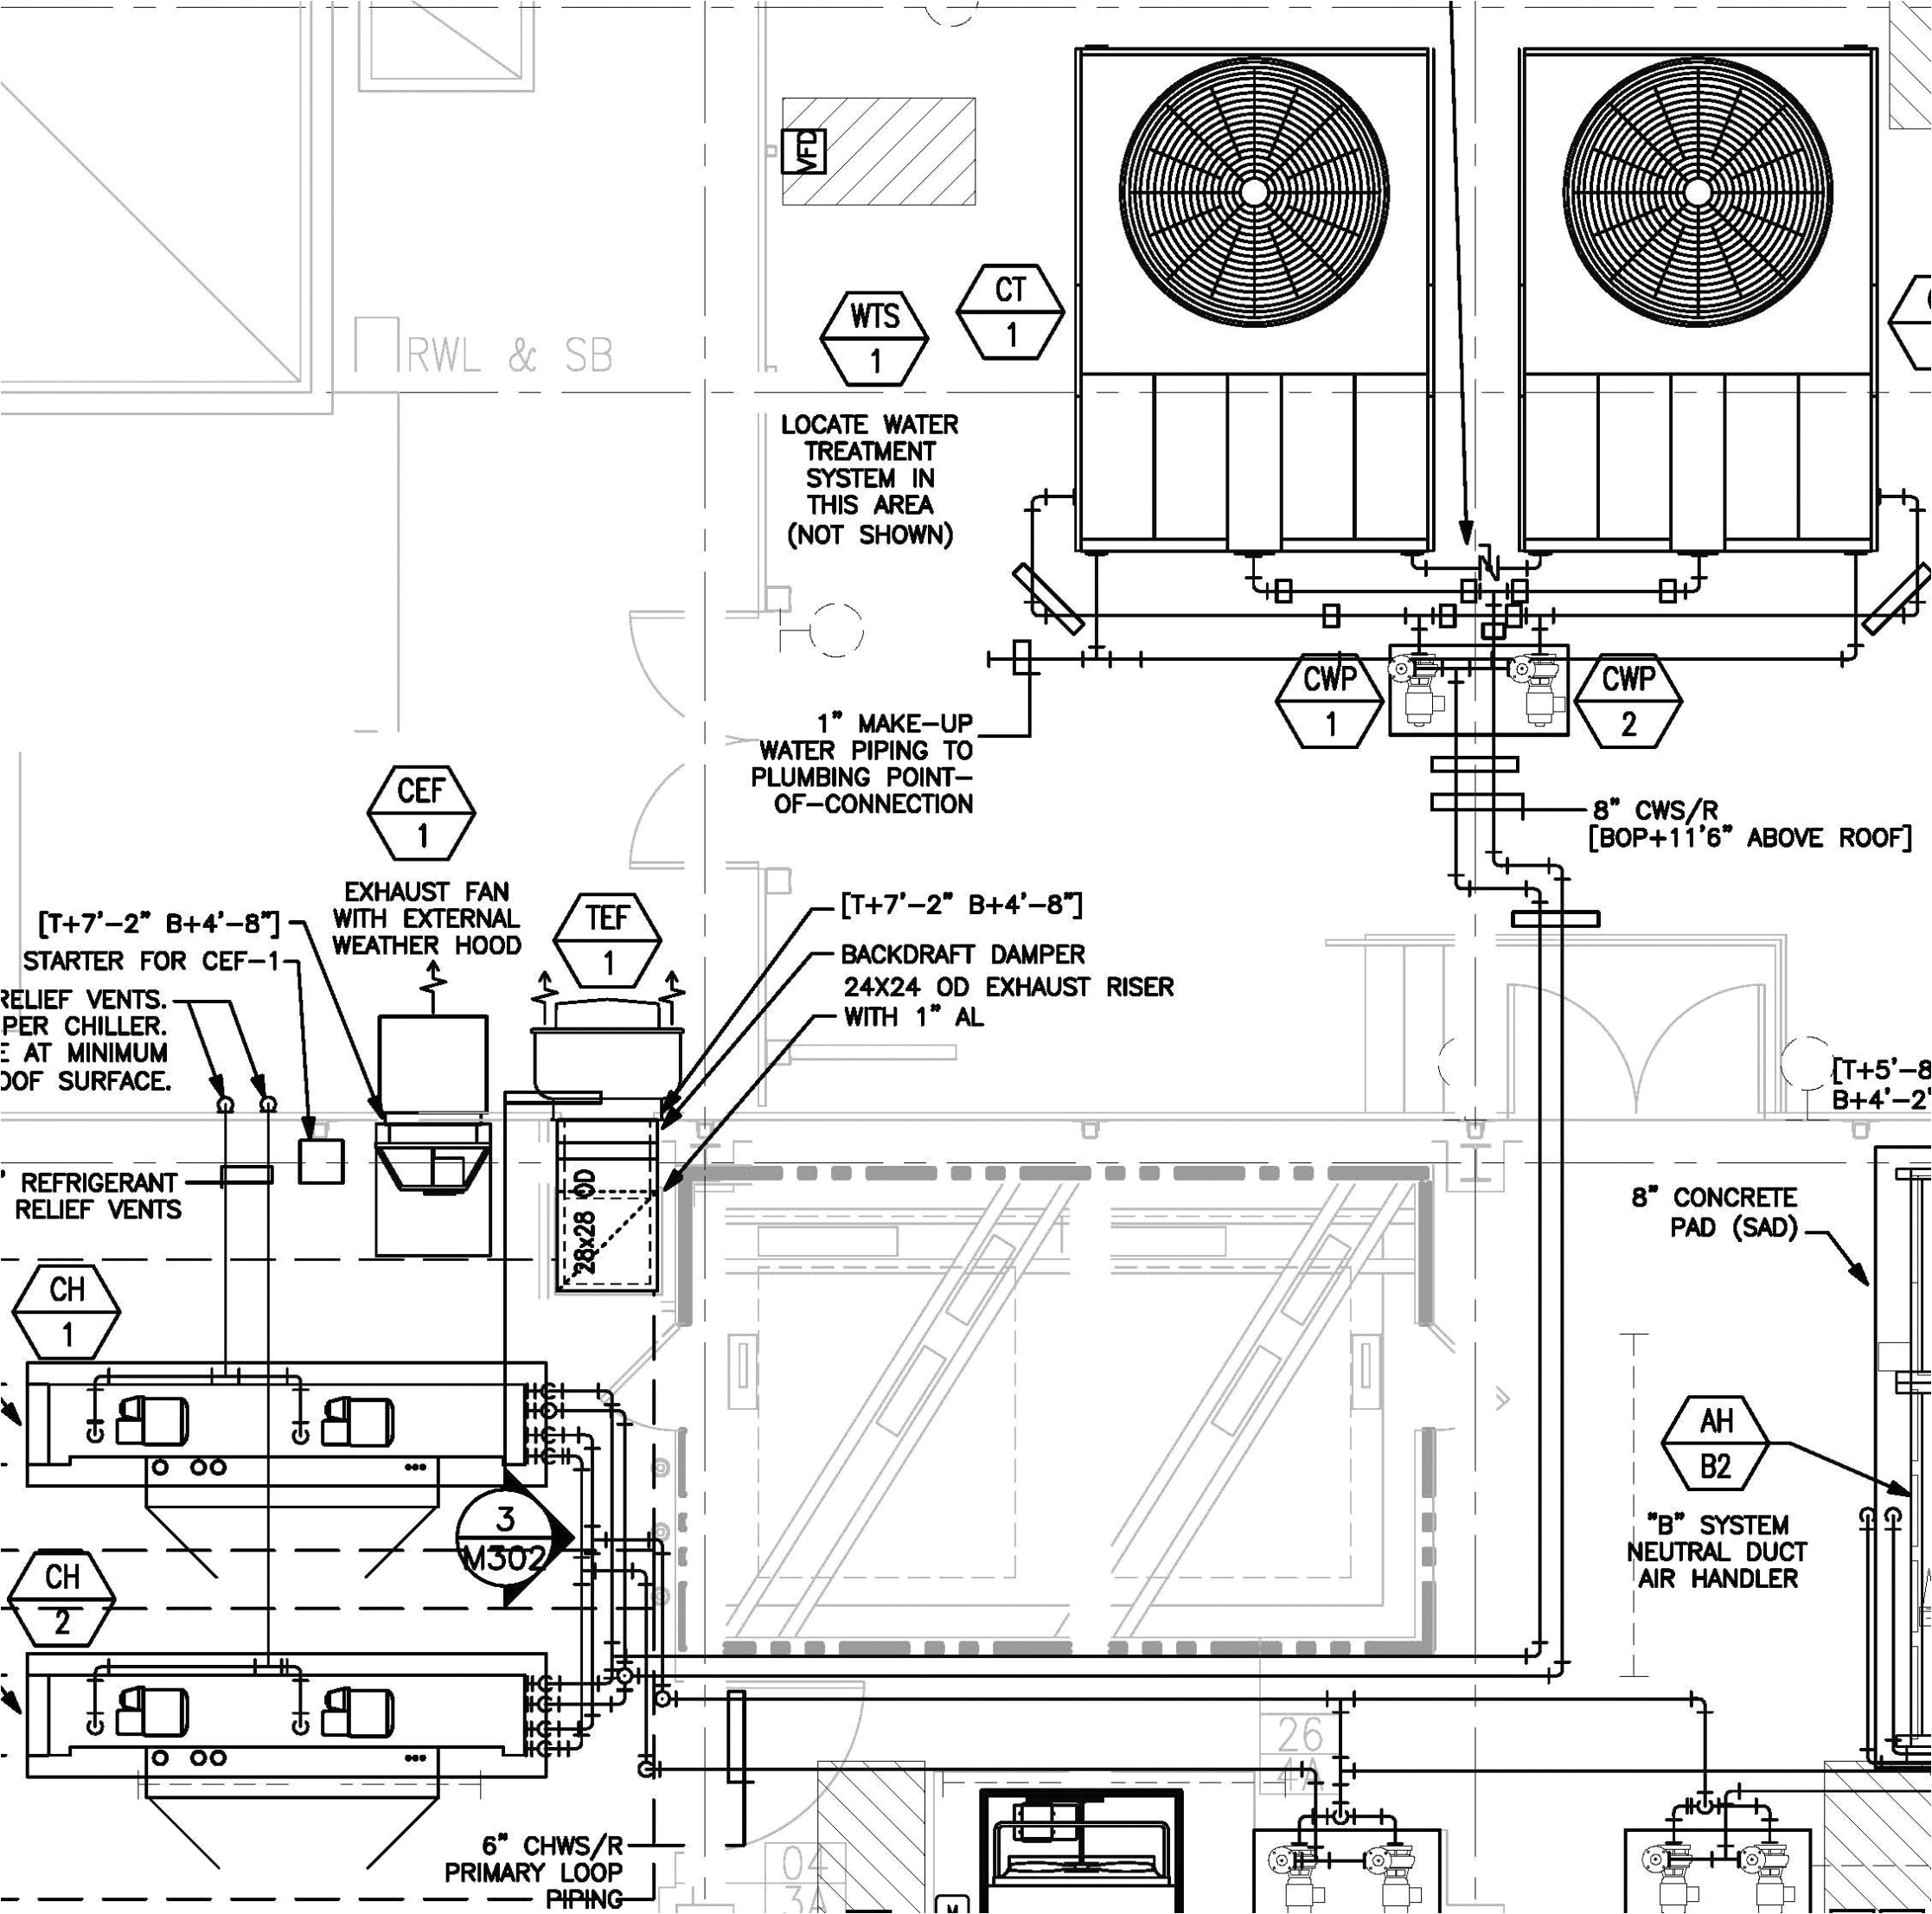 wiring diagram for capacitor start motor fresh two value capacitor motor wiring diagram 2018 wiring diagram two